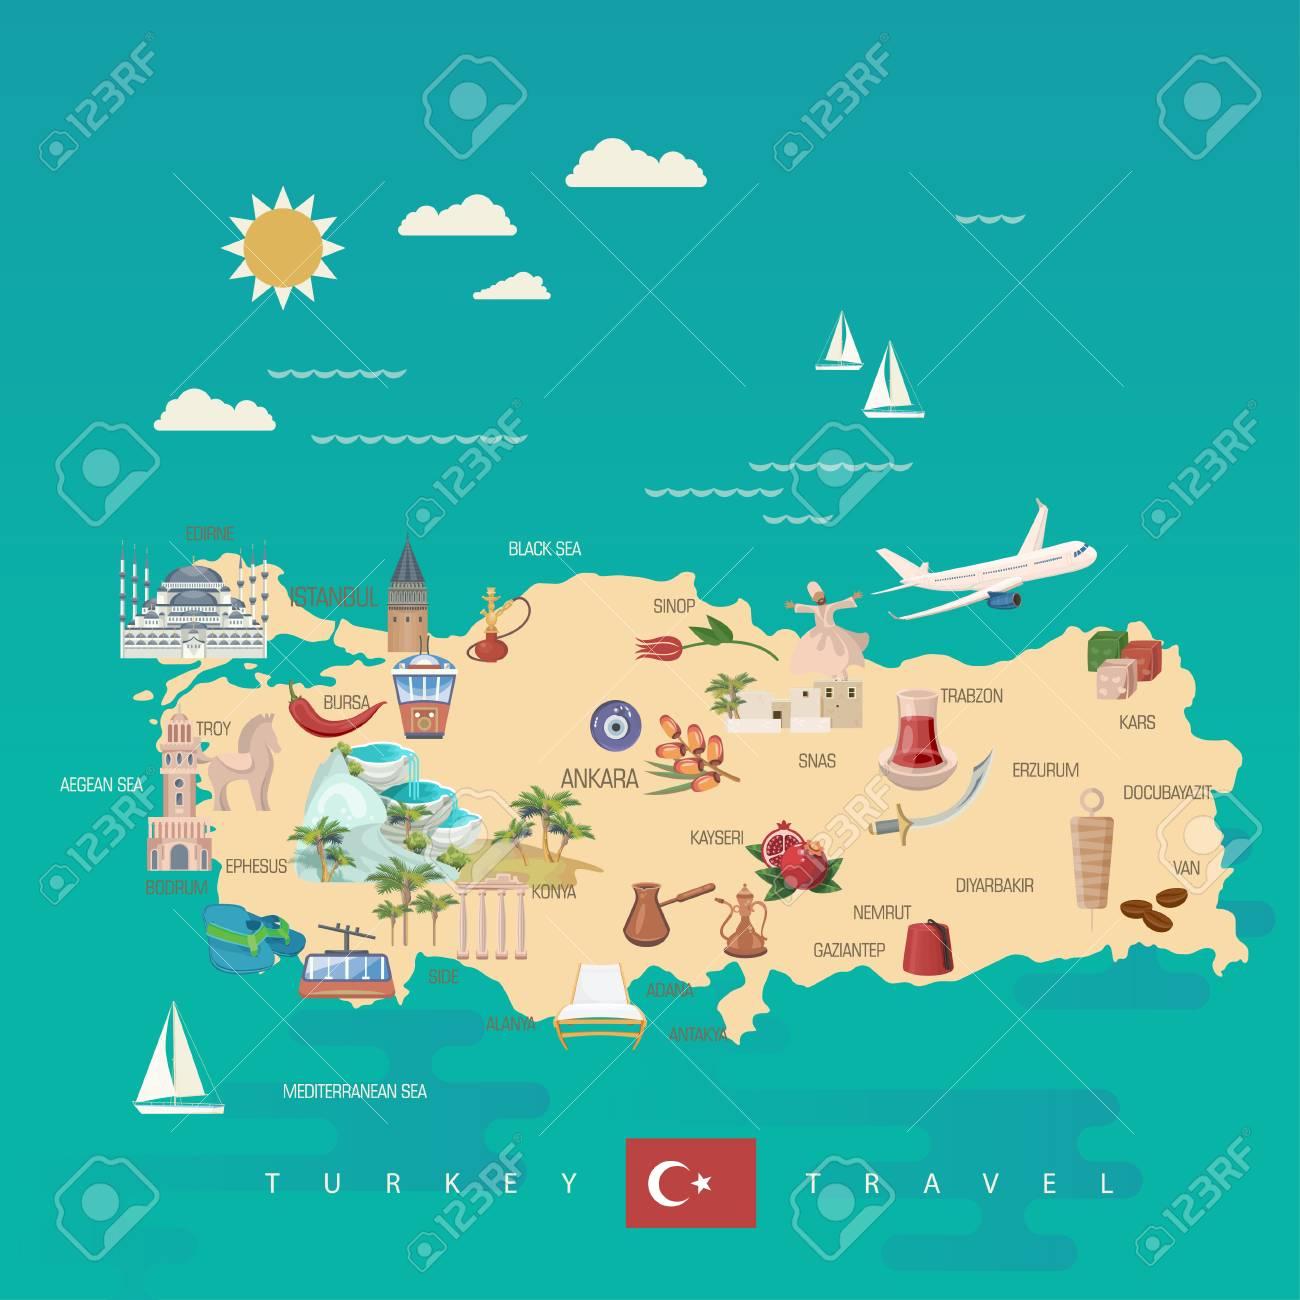 Turkey vector vacations illustration with turkish landmarks. Travel agency poster. - 94432154